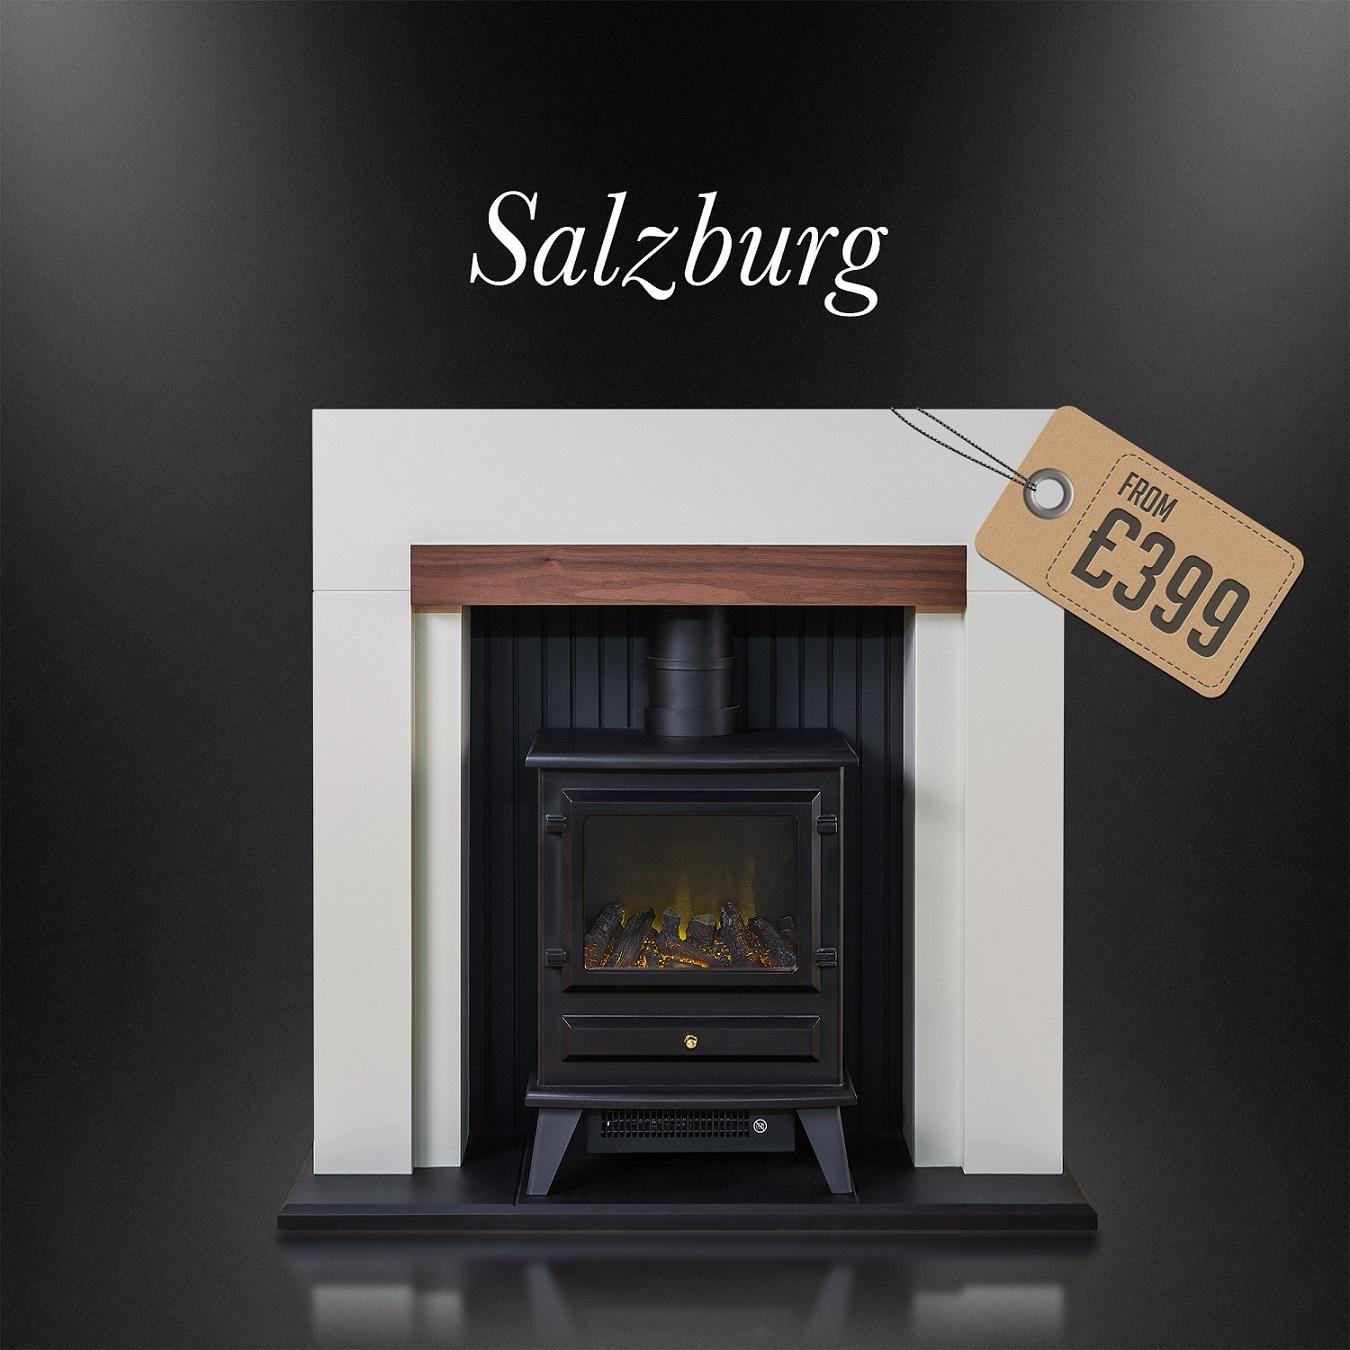 The Salzburg